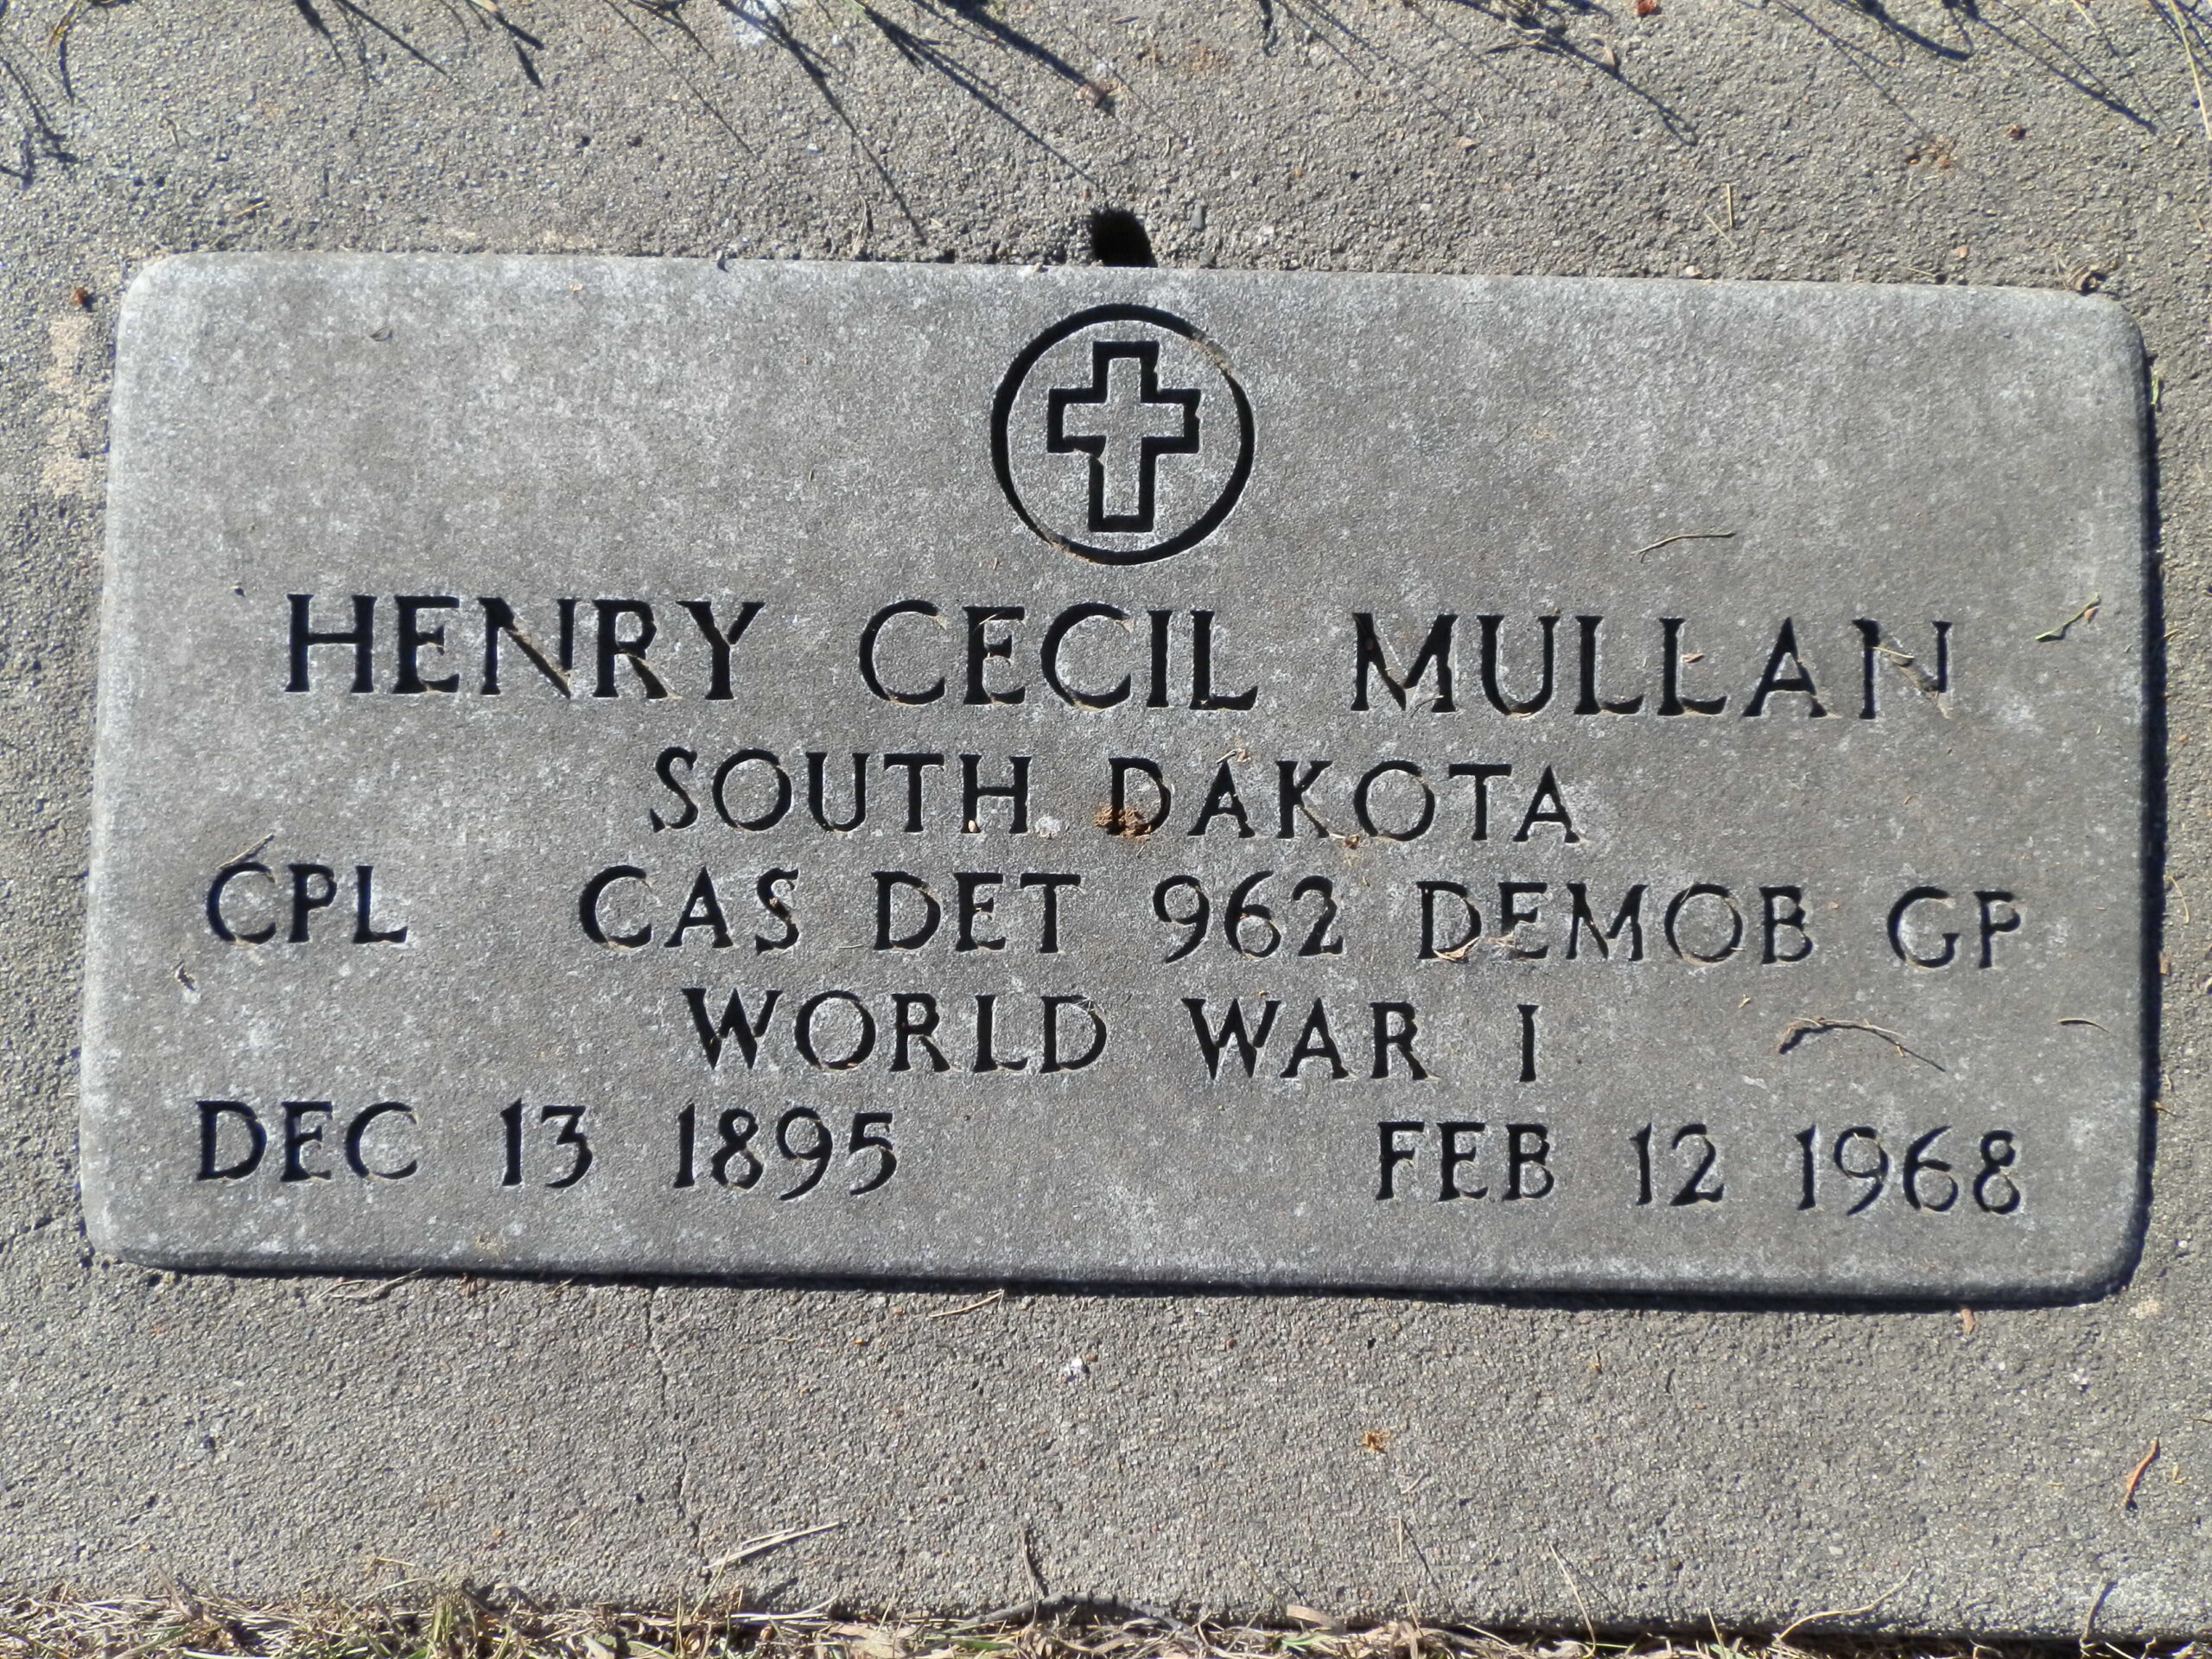 Cecil Mullan